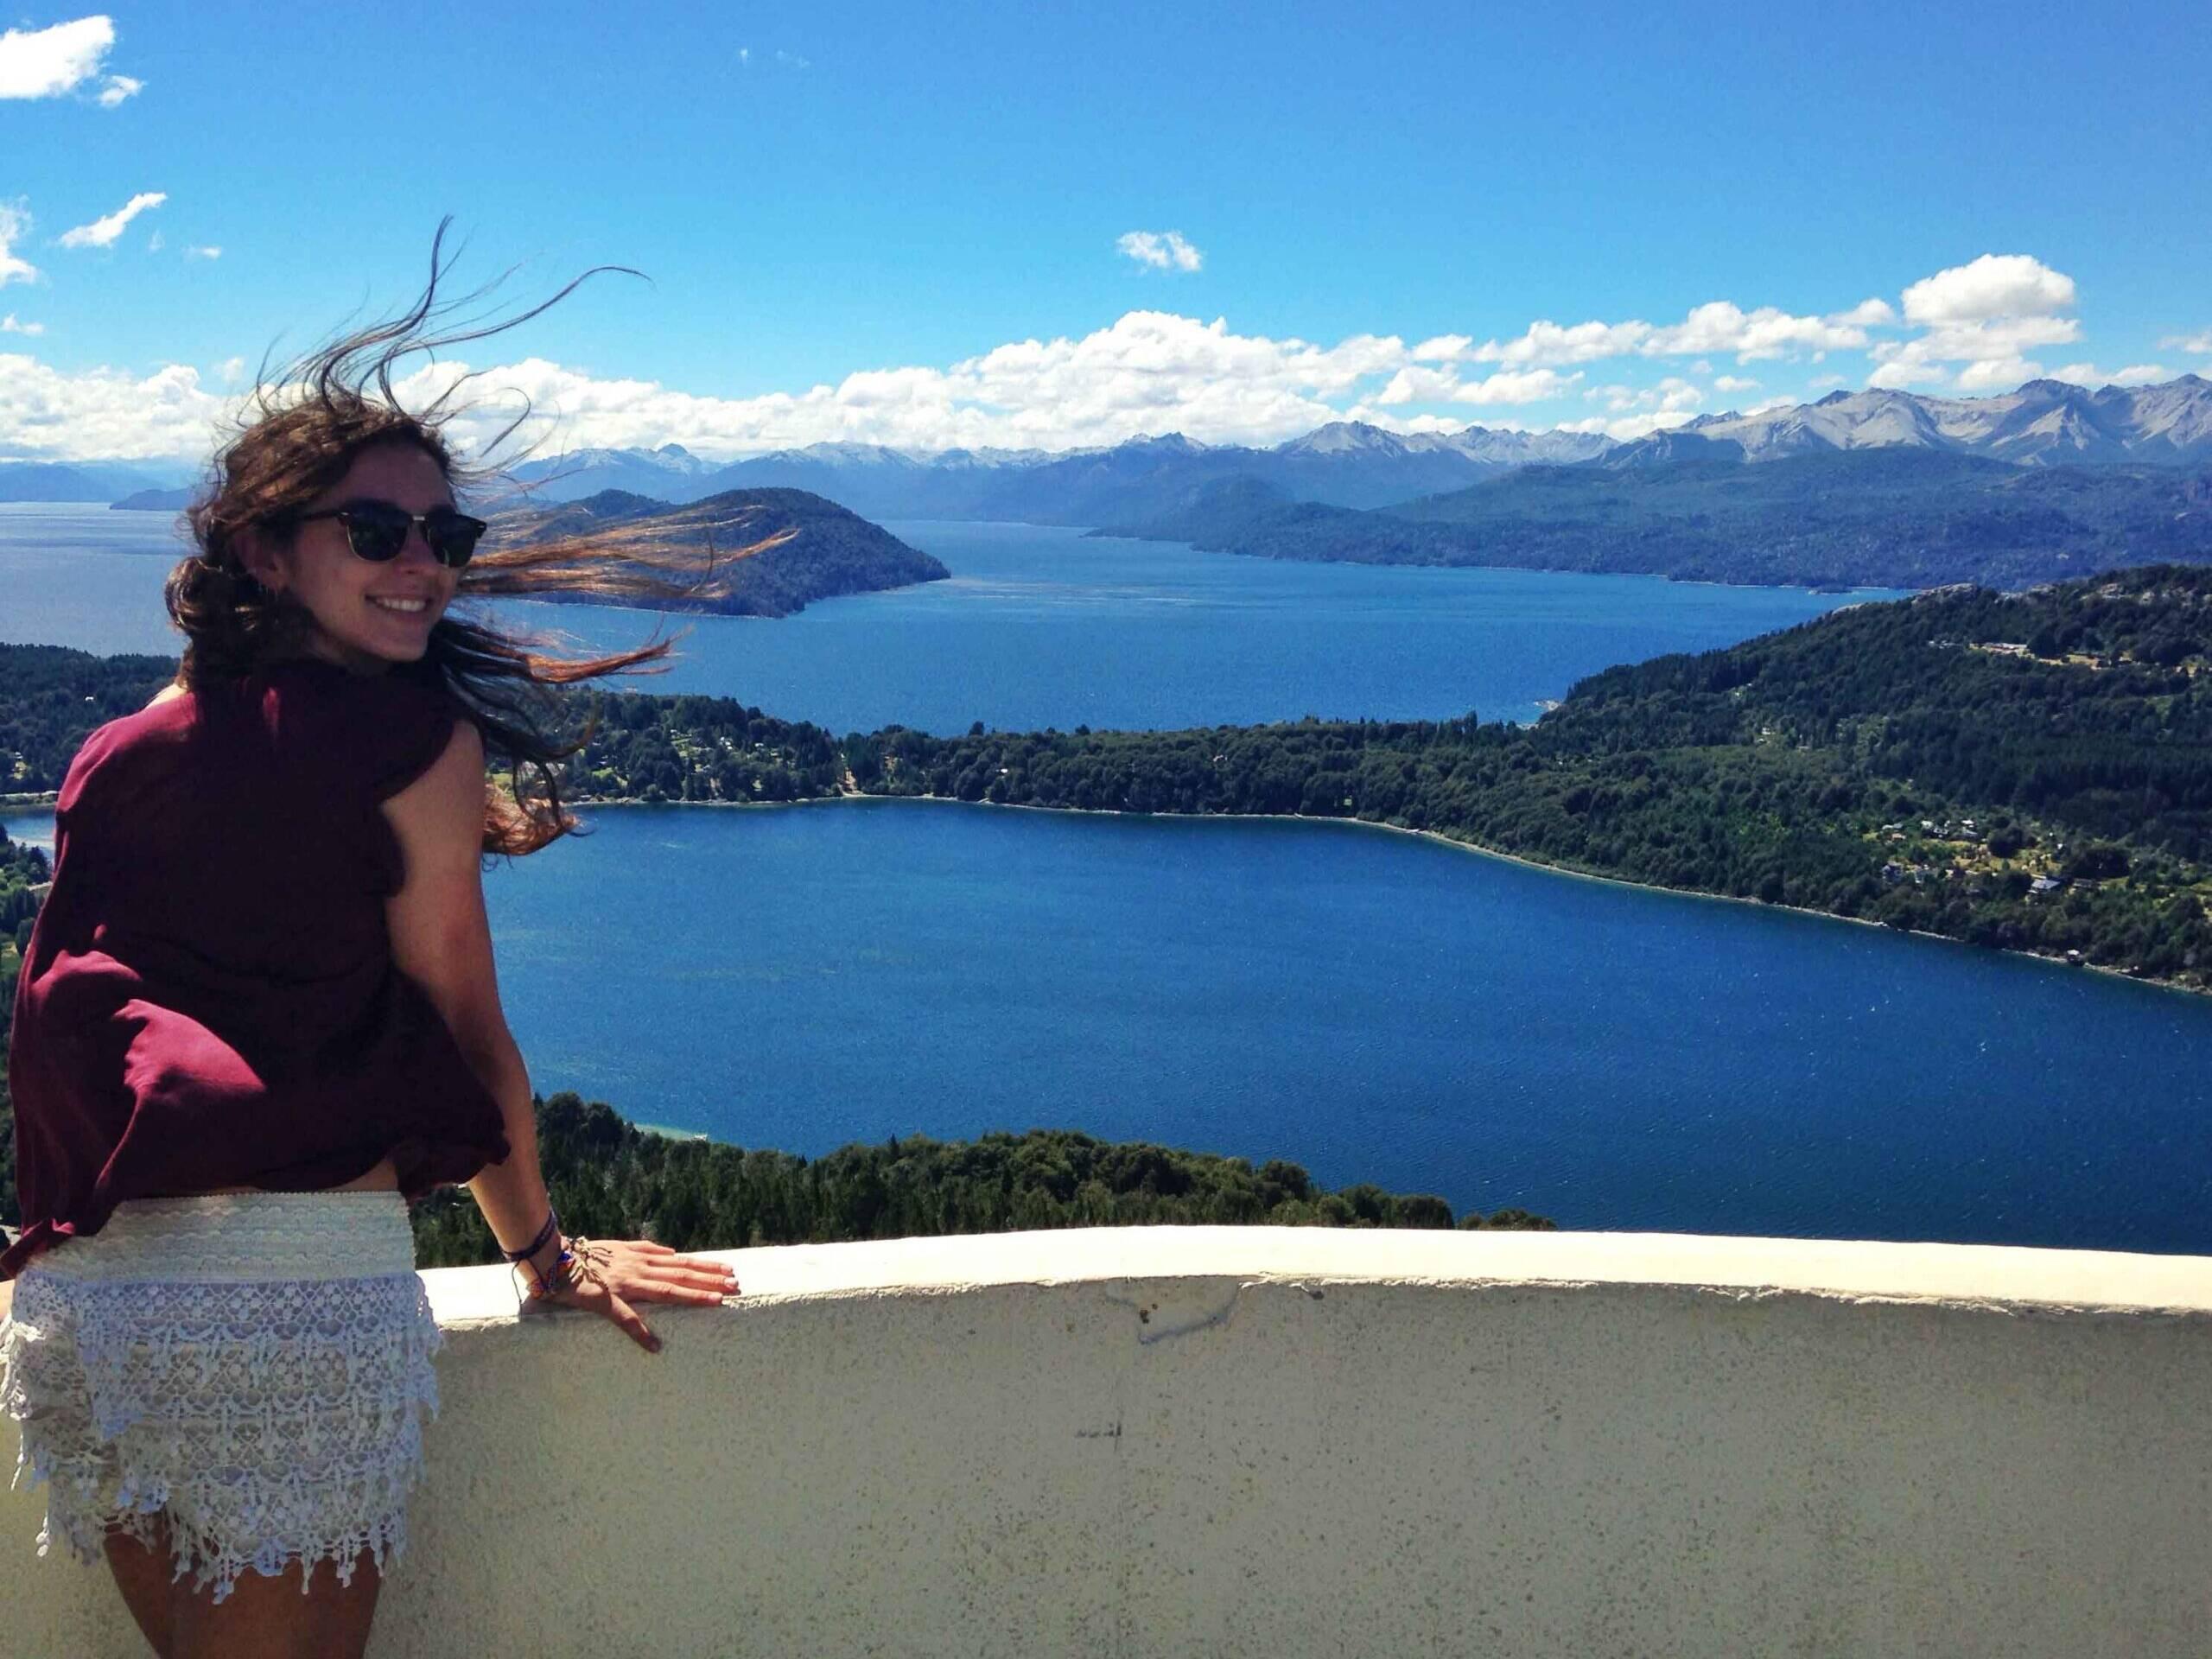 Lake views of Bariloche in Argentina